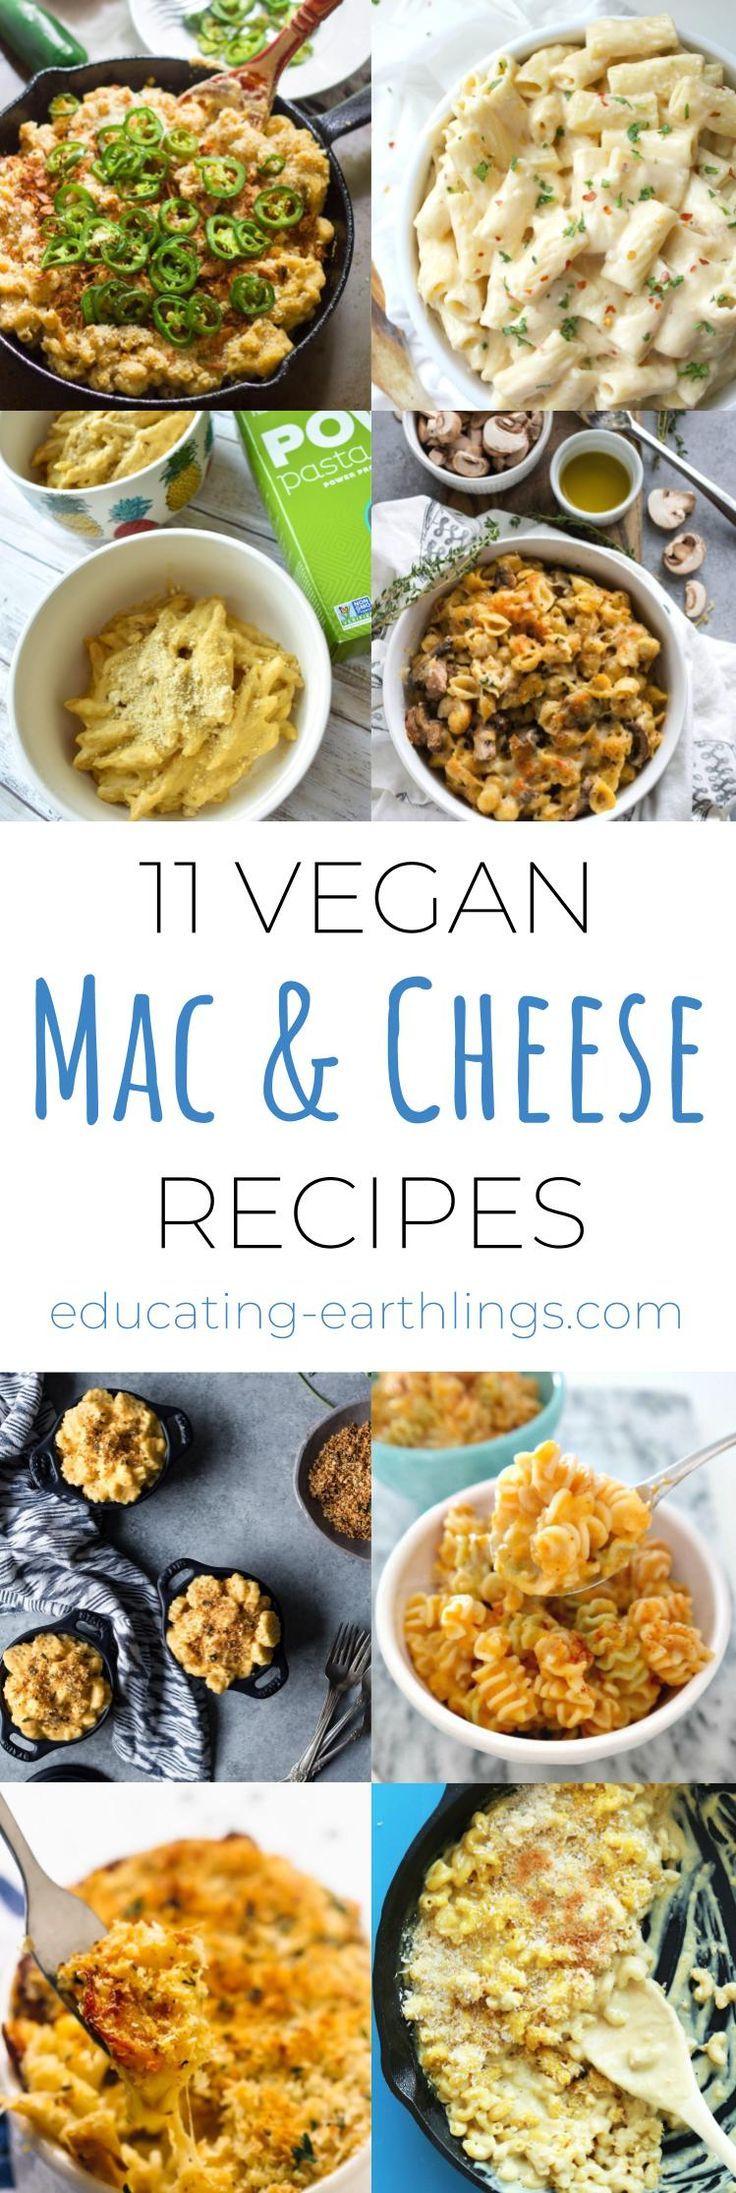 Vegan mac & Cheese recipes. Vegan cheese. Plant based Mac & Cheese. Healthy Mac & Cheese. Homemade Mac & Cheese. Dairy free Mac & cheese recipes. Vegan protein. Plant based protein. Vegan Mac & Cheese sauce. Vegan starter guide. Vegan meal prep. Plant based meal prep.